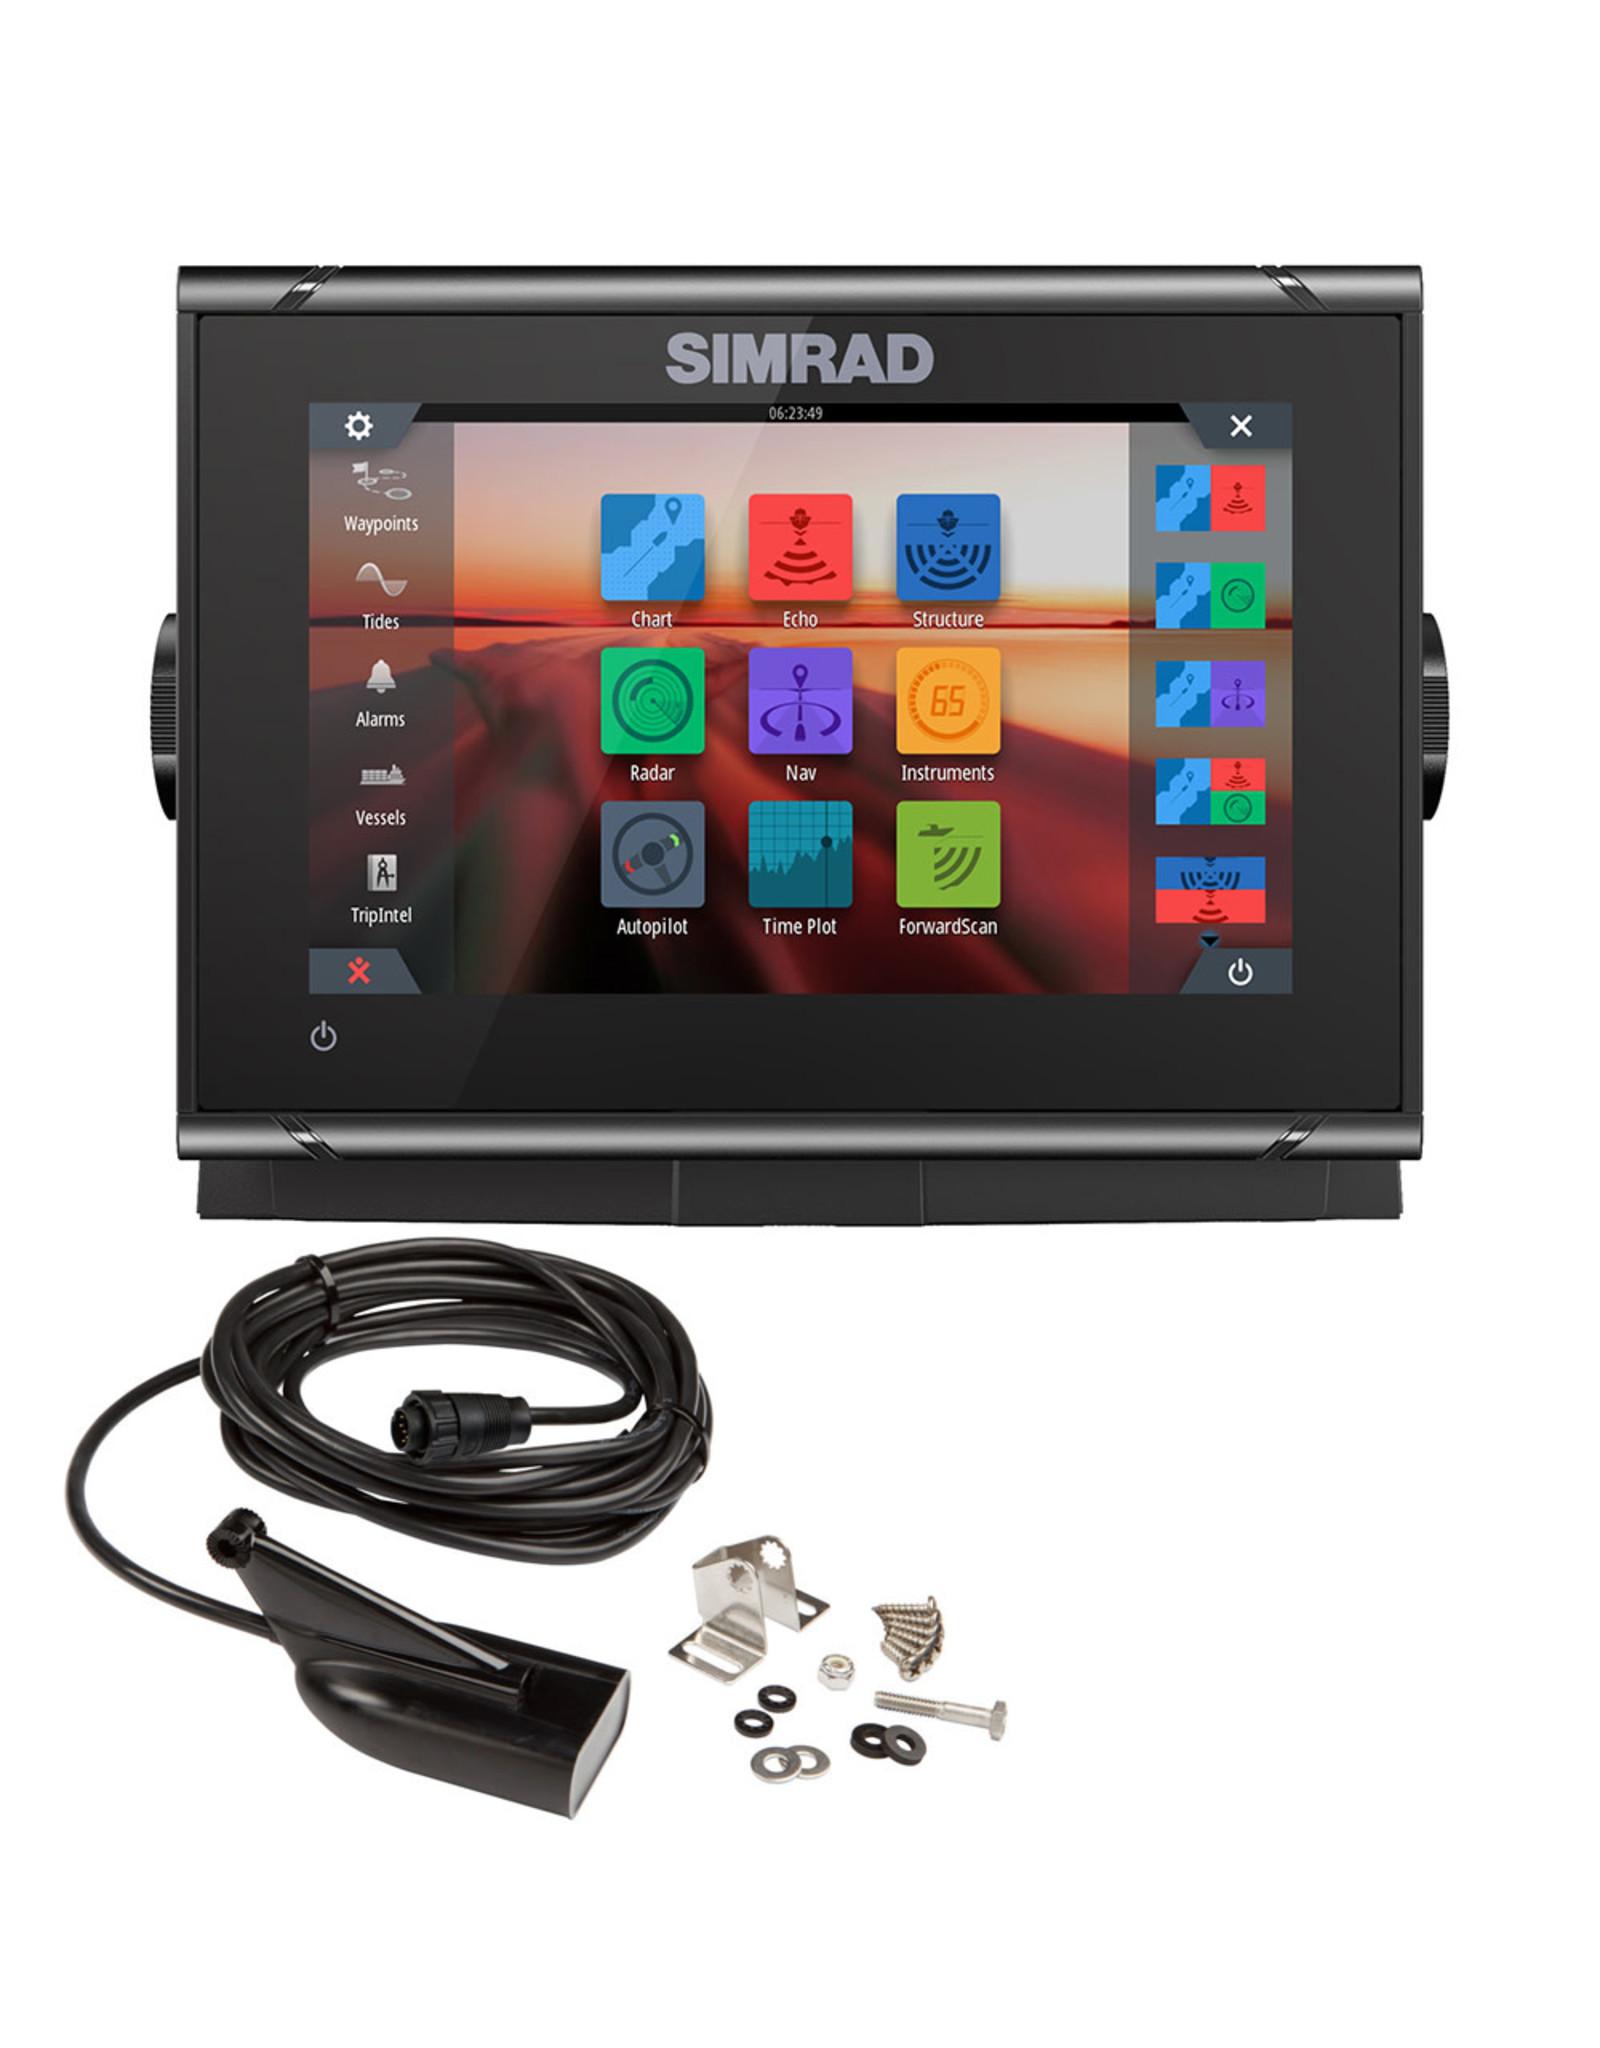 SIMRAD Simrad GO7 XSR Combo HDI Skimmer Transducer